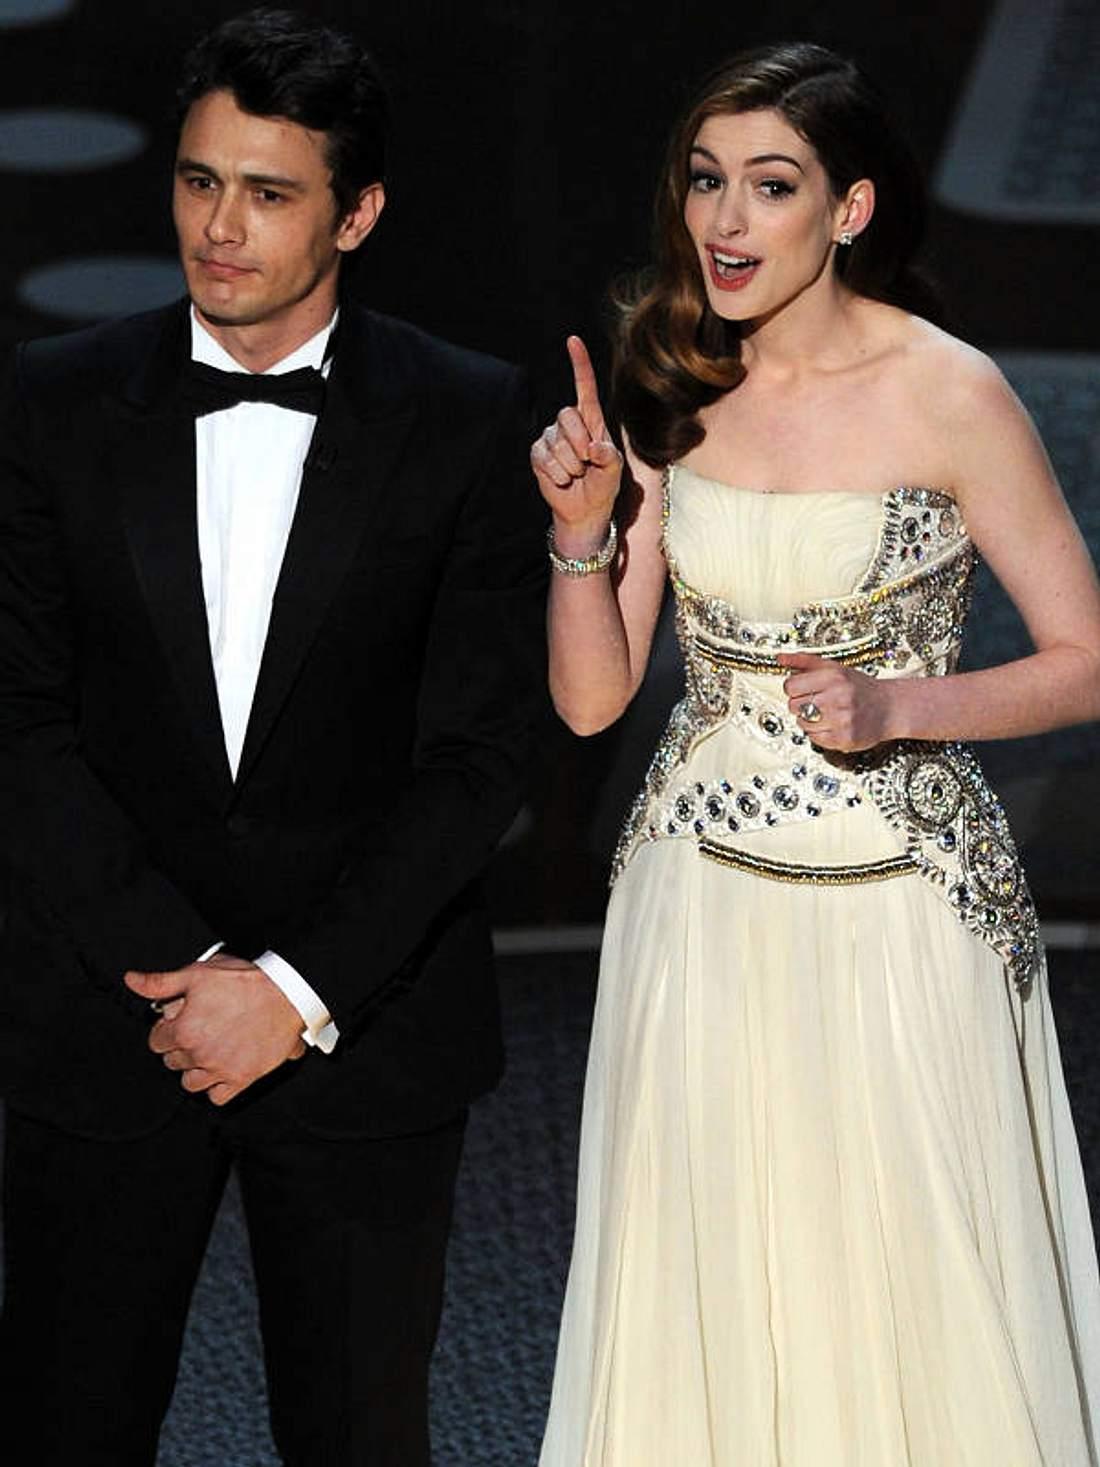 Die Oscar-Verleihung 2011: Die Highlights - Bild 1